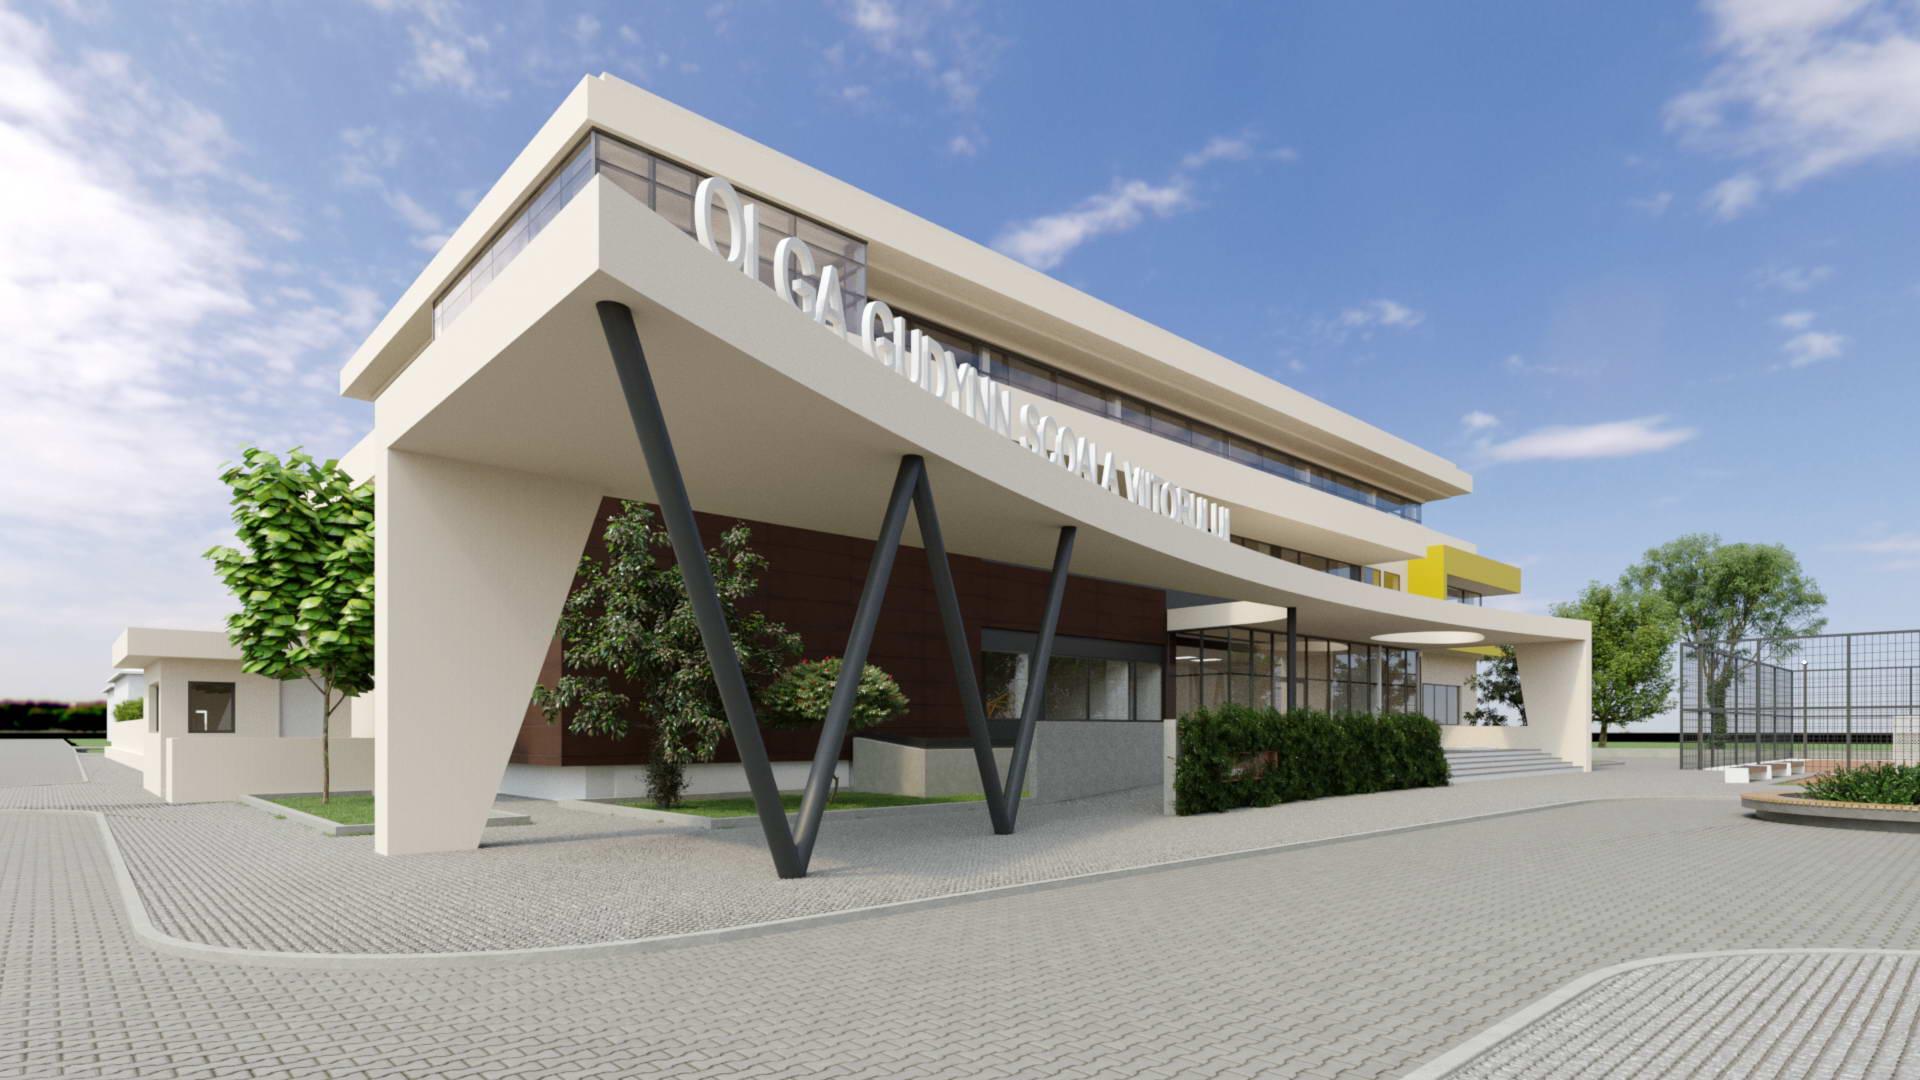 https://nbc-arhitect.ro/wp-content/uploads/2020/10/NBC-Arhitect-_-public-buildings-_-Olga-Gudynn-Intl-School-Bucharest-_-Bucharest-Romania_1.jpg